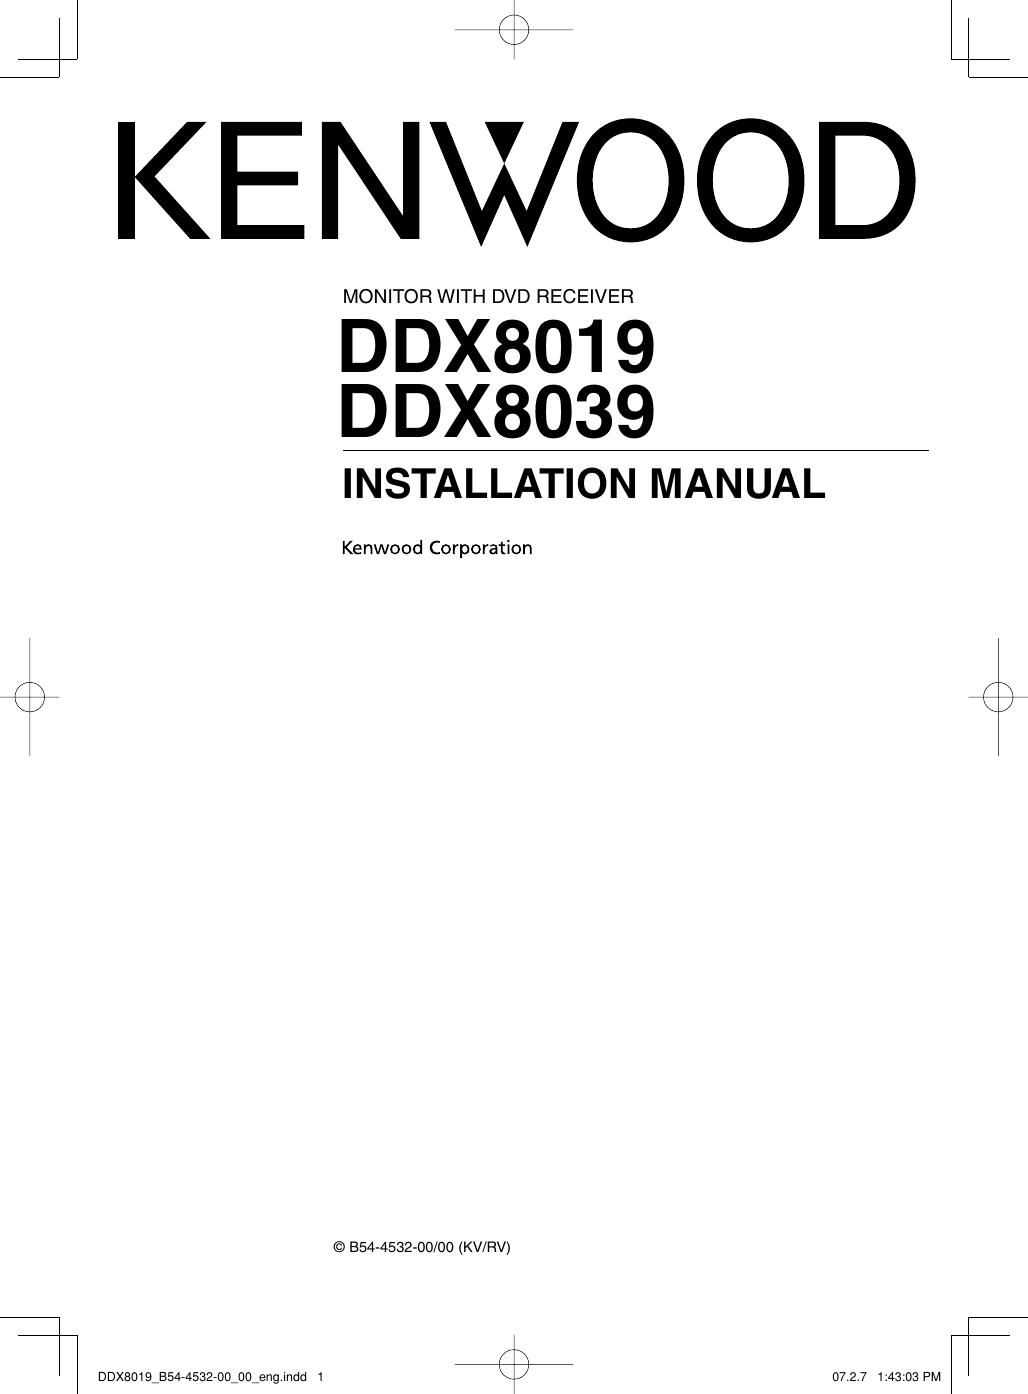 kenwood excelon ddx8019 users manual ddx8019_b54 4532 00_00_engpage 1 of 12 kenwood kenwood excelon ddx8019 users manual